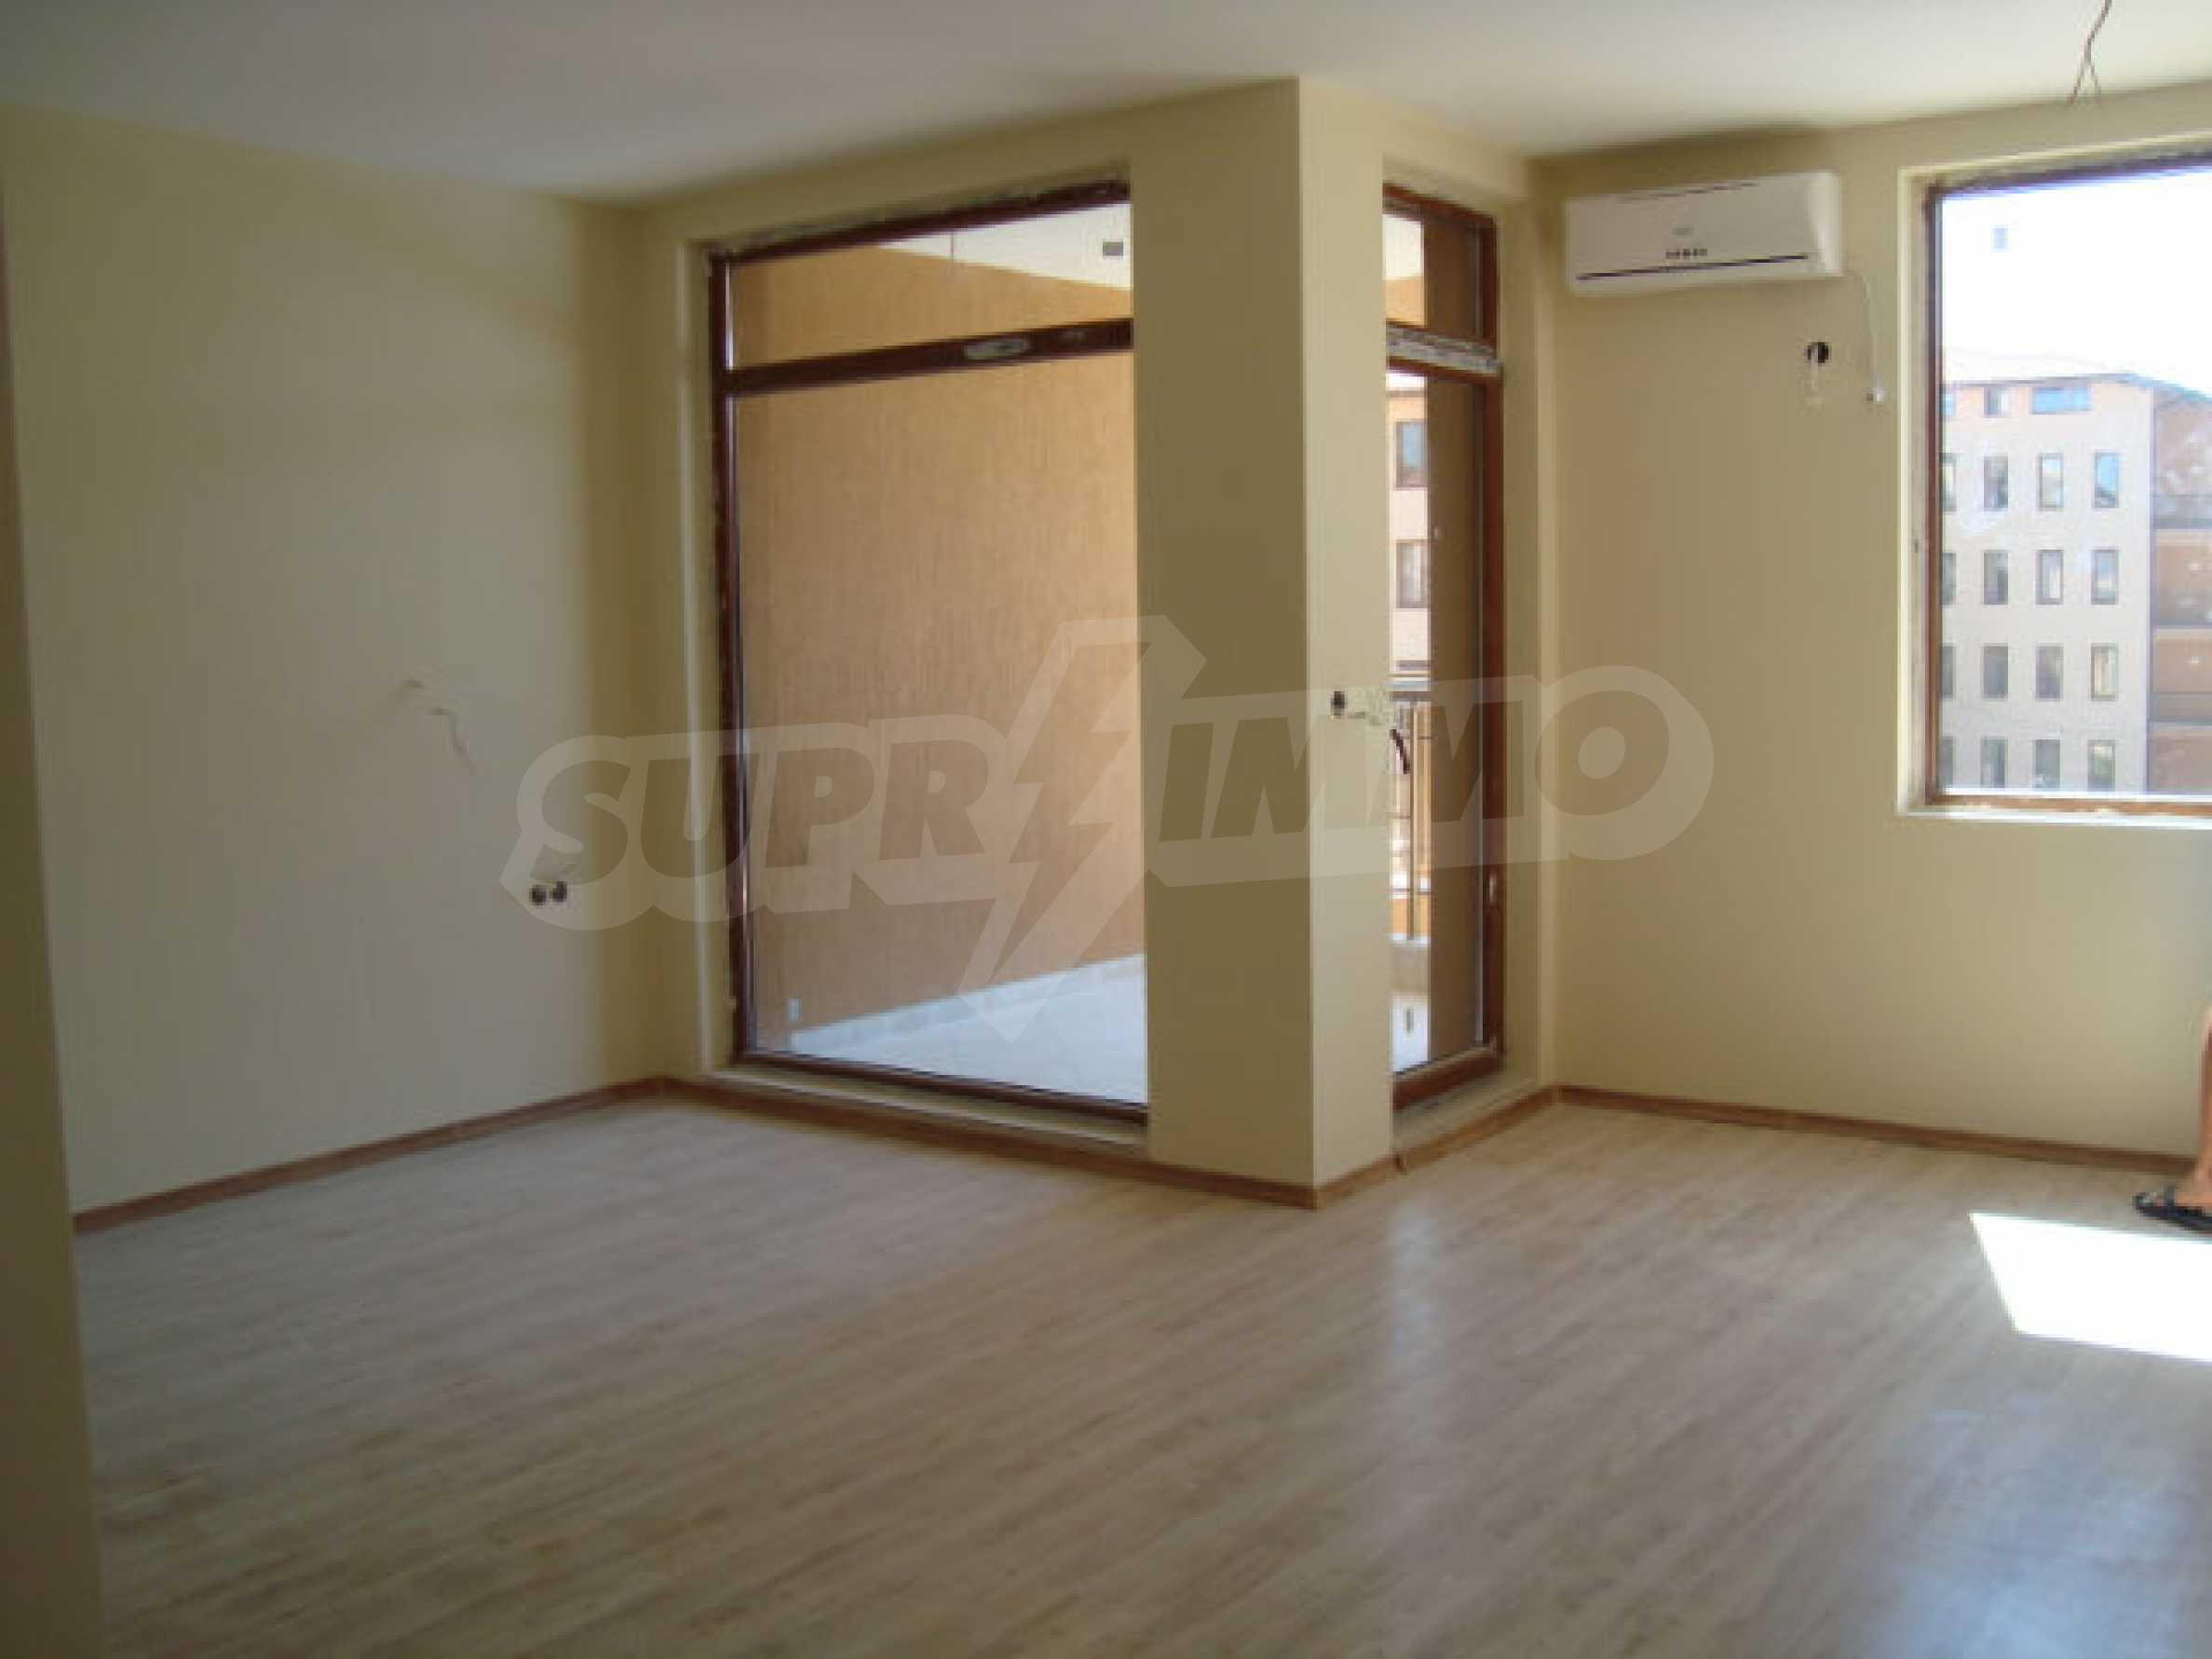 Studios und Apartments im Nestinarka-Komplex in Tsarevo 23